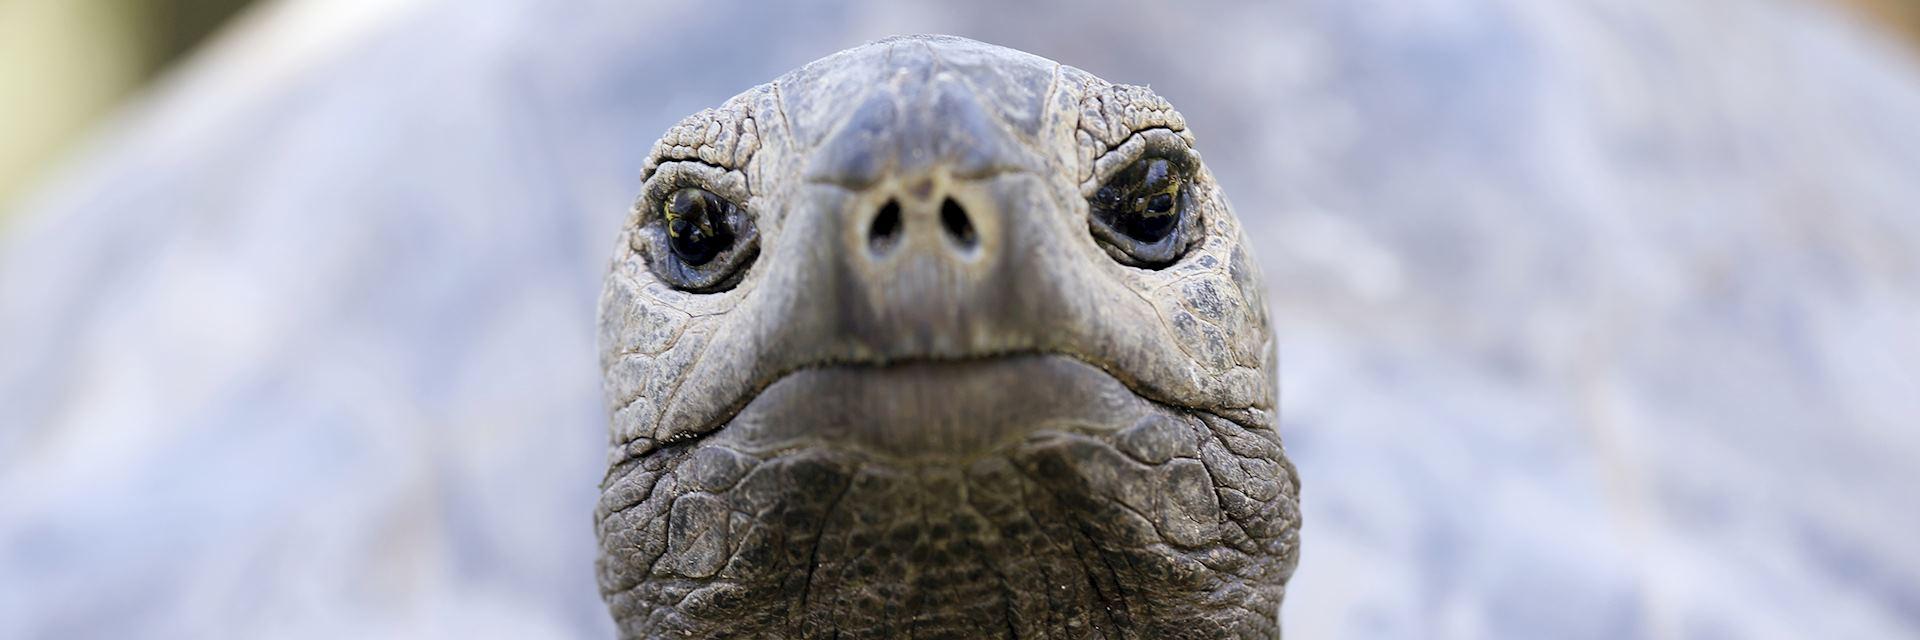 Giant tortoise, Corieuse Island